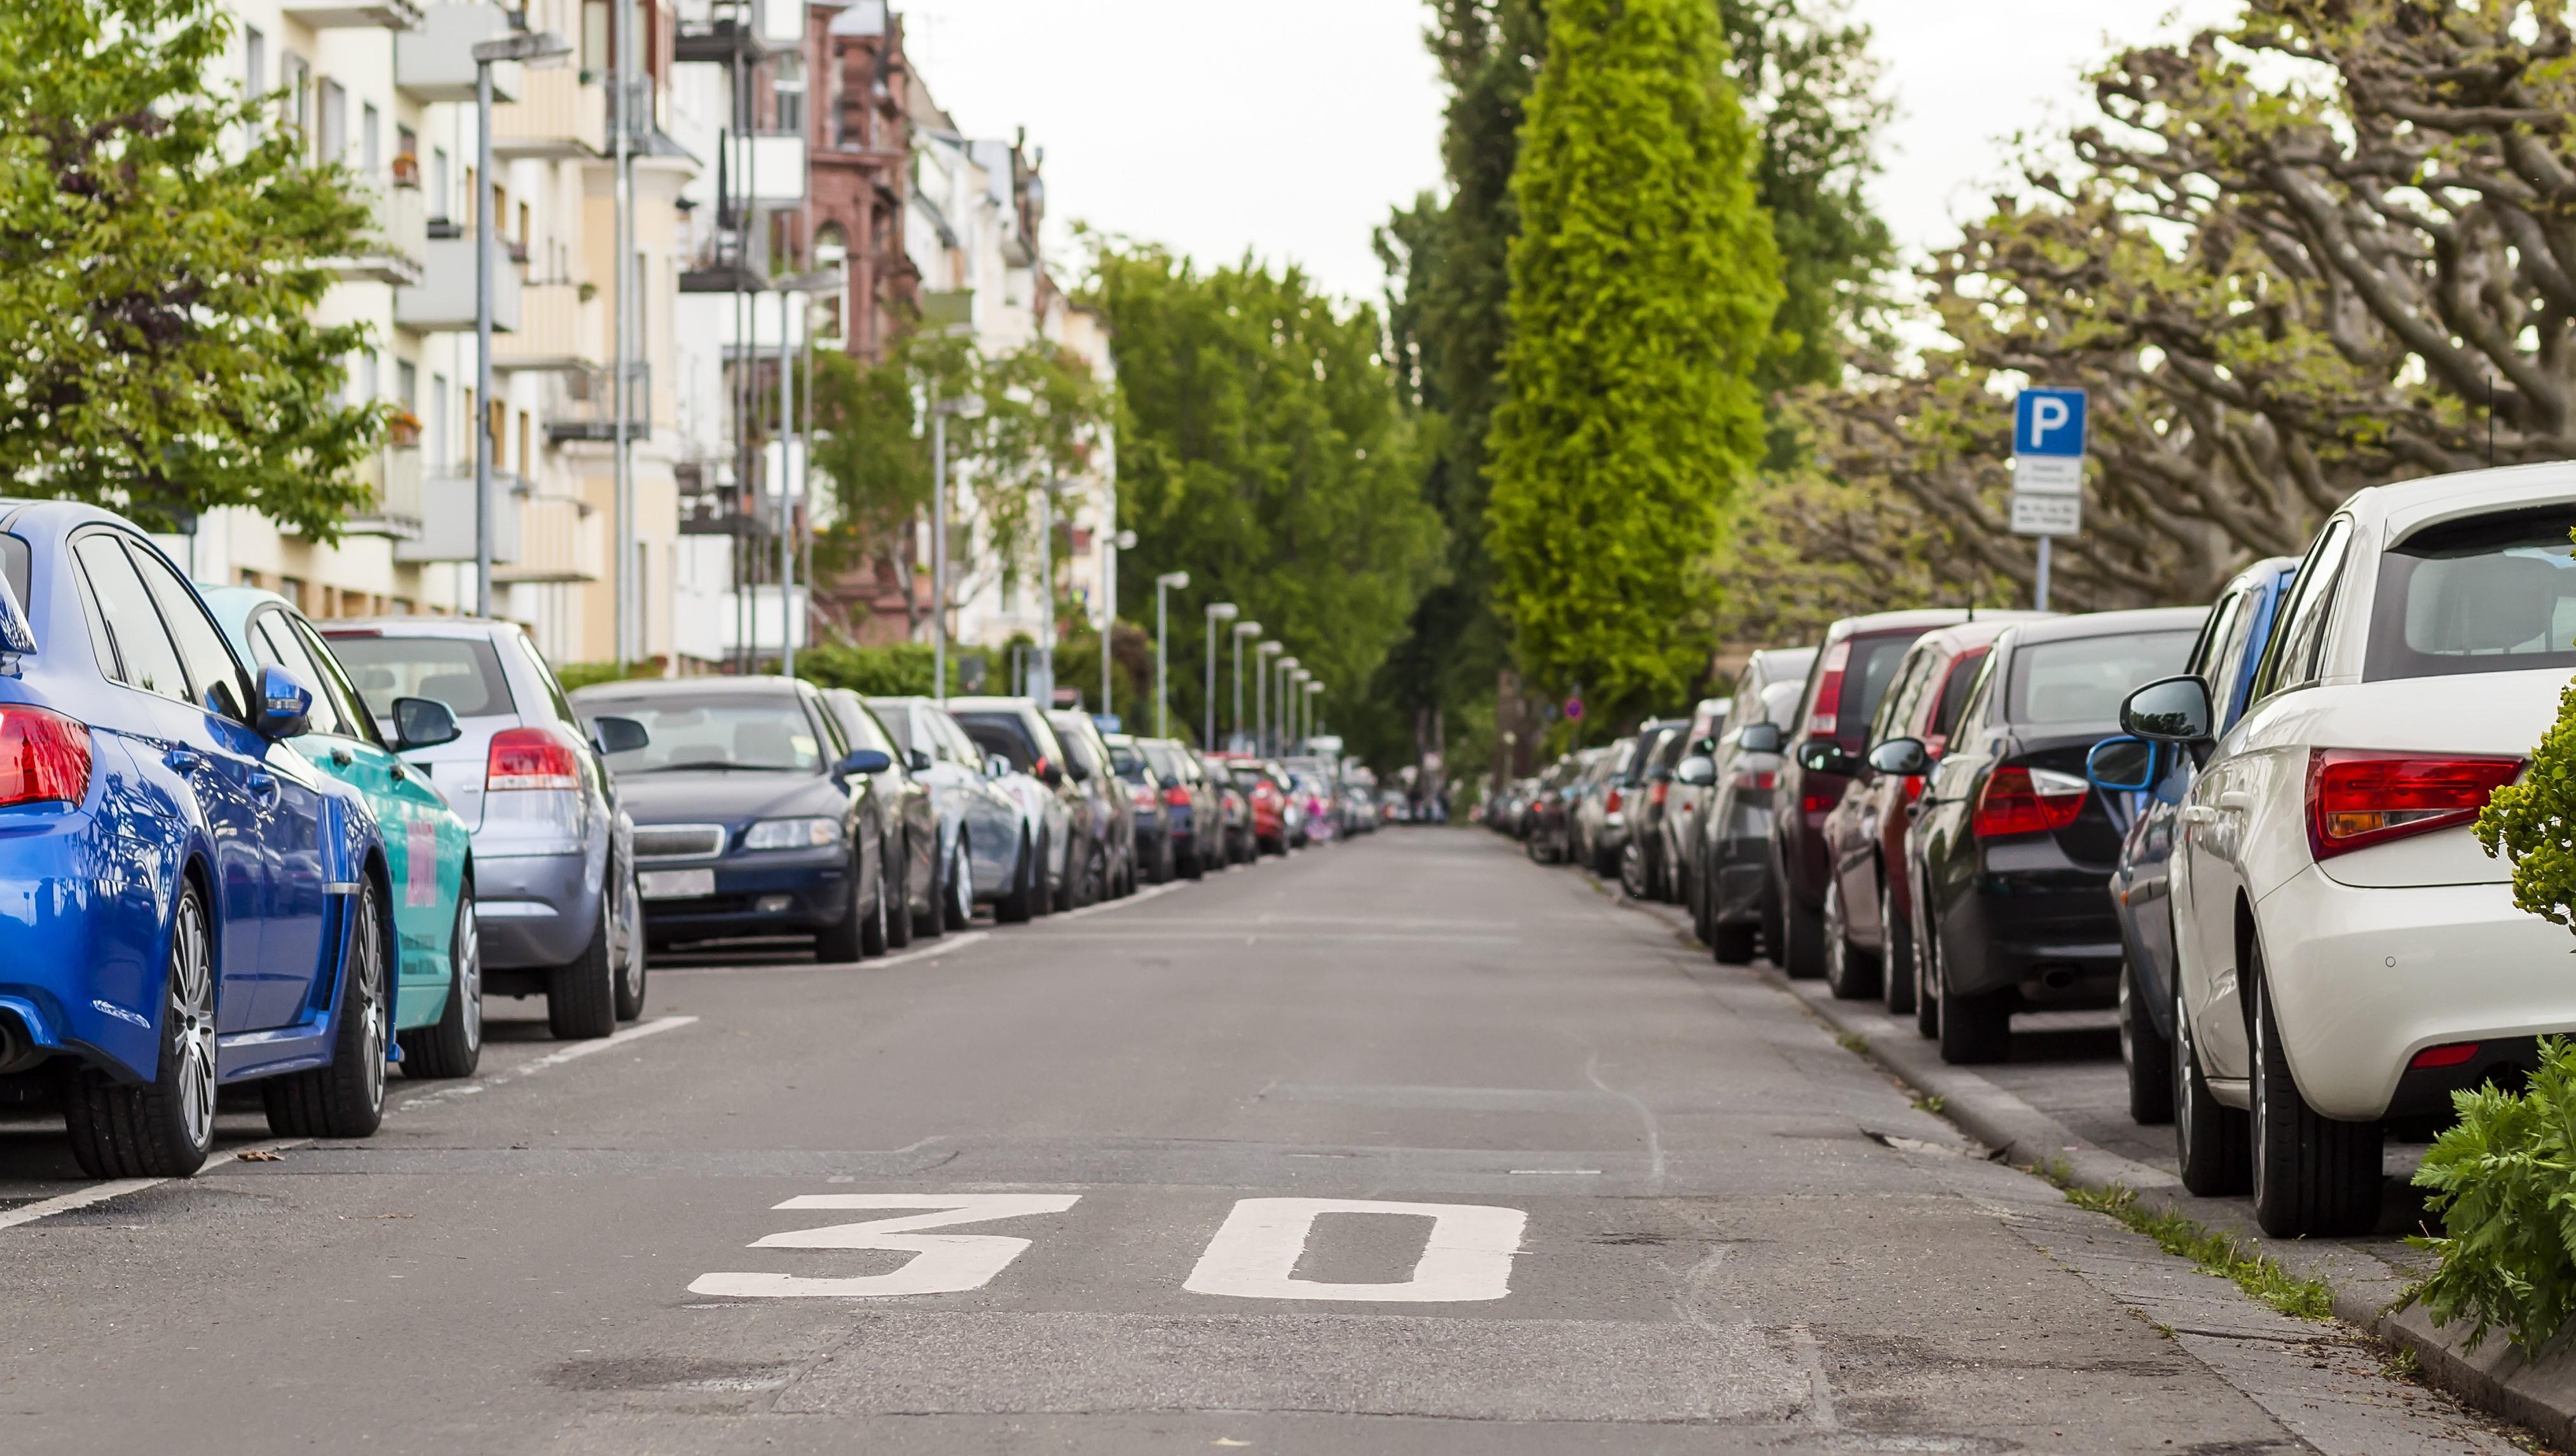 Parking vehicles